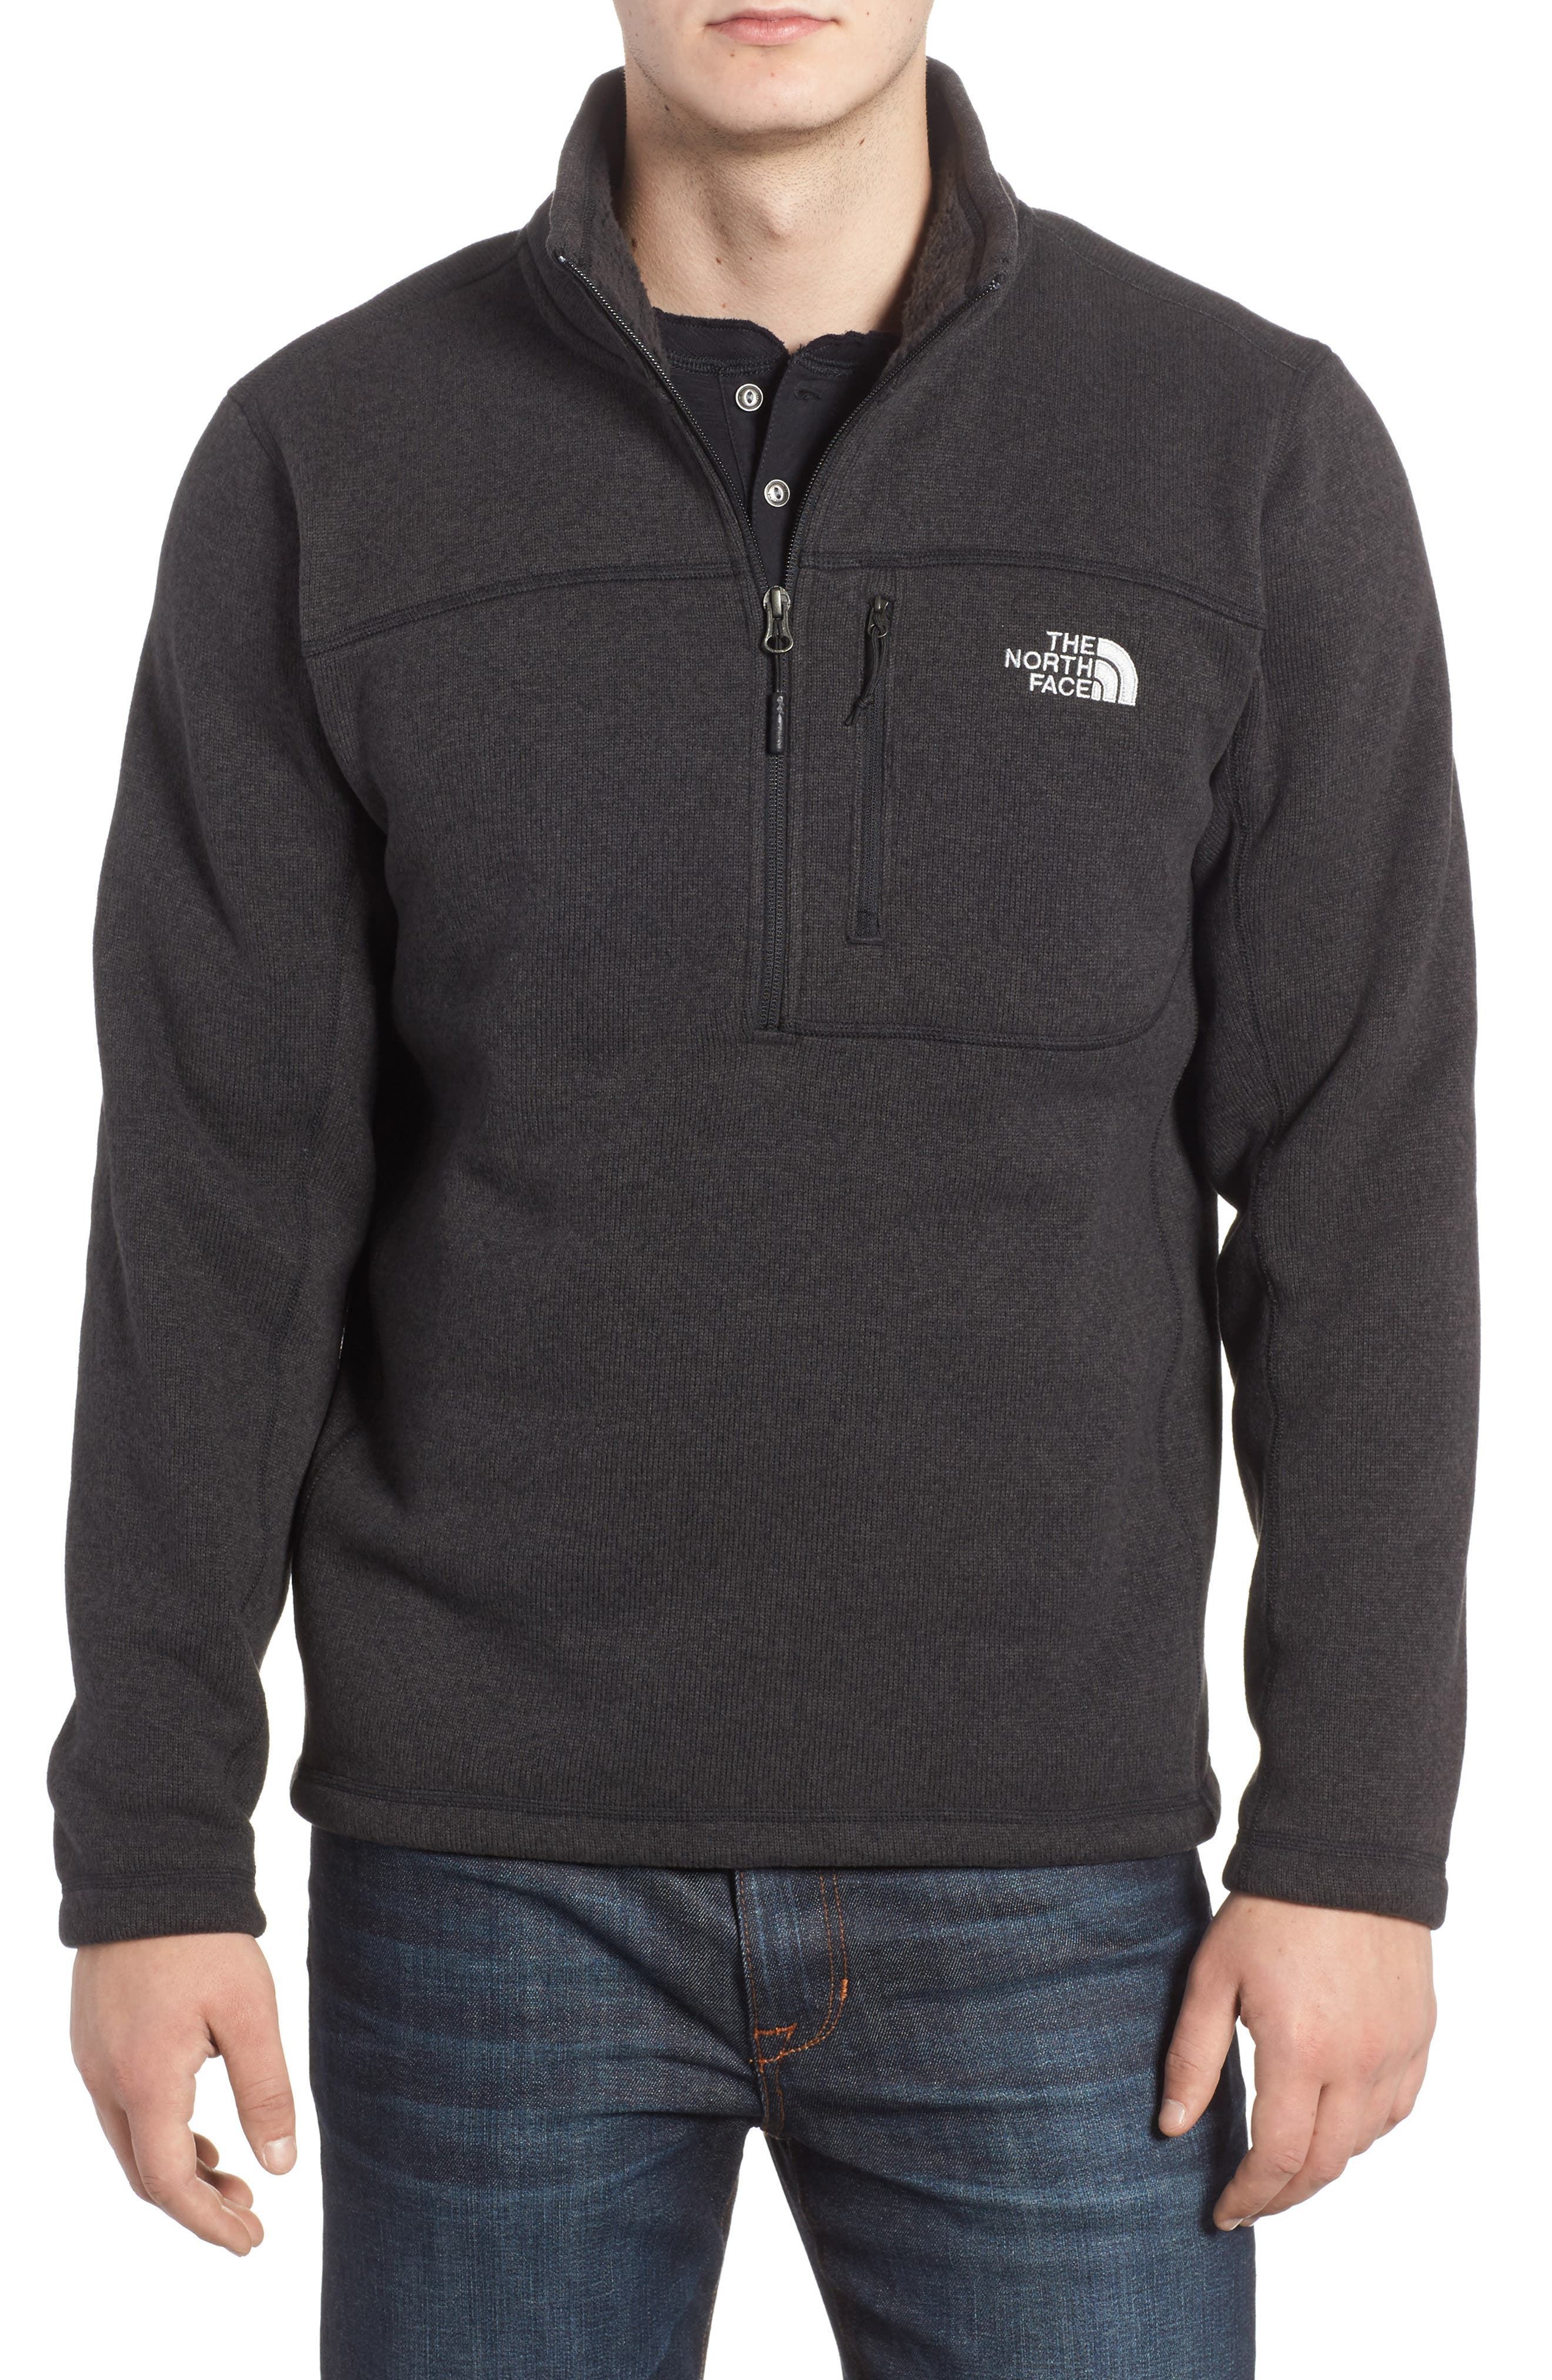 THE NORTH FACE, Gordon Lyons Quarter-Zip Fleece Jacket, Main thumbnail 1, color, 001